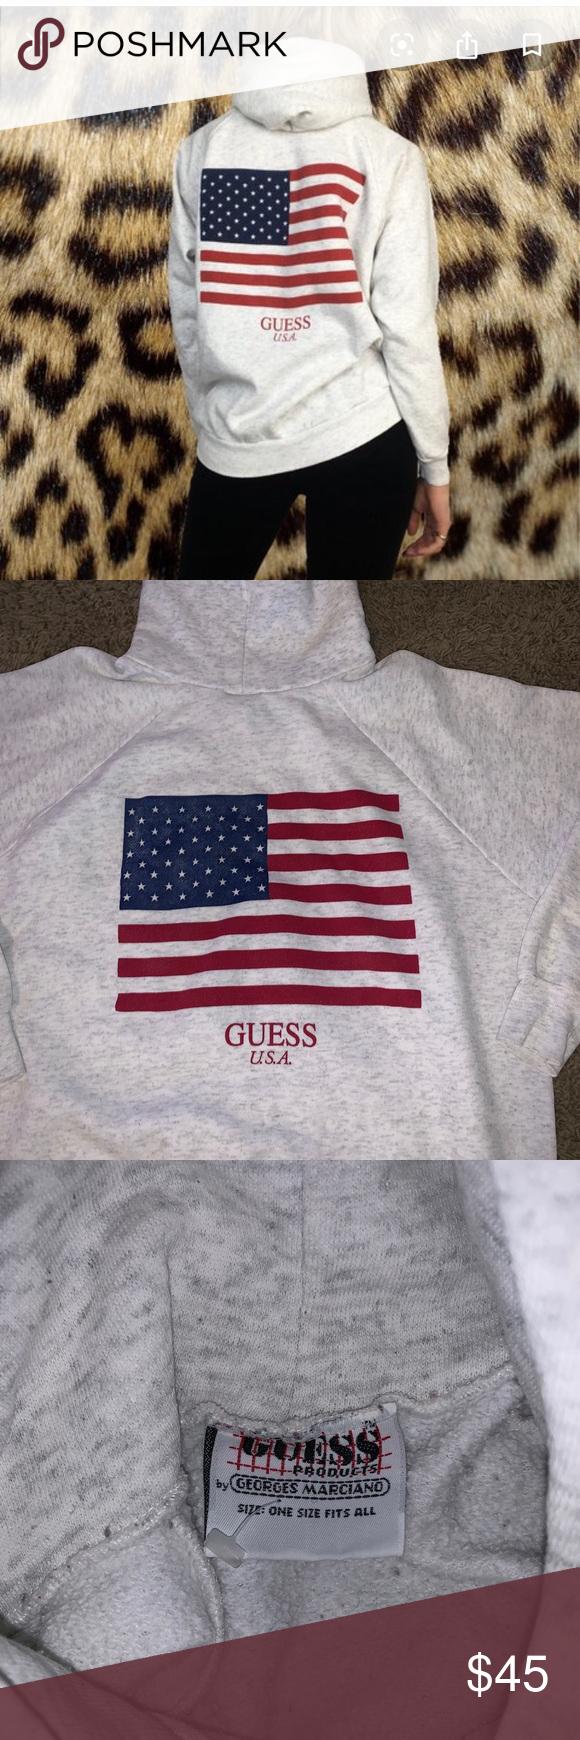 Vintage Guess American Flag Logo Osfa Excellent American Flag Sweatshirt Sweatshirts Hoodie Vintage American Flag